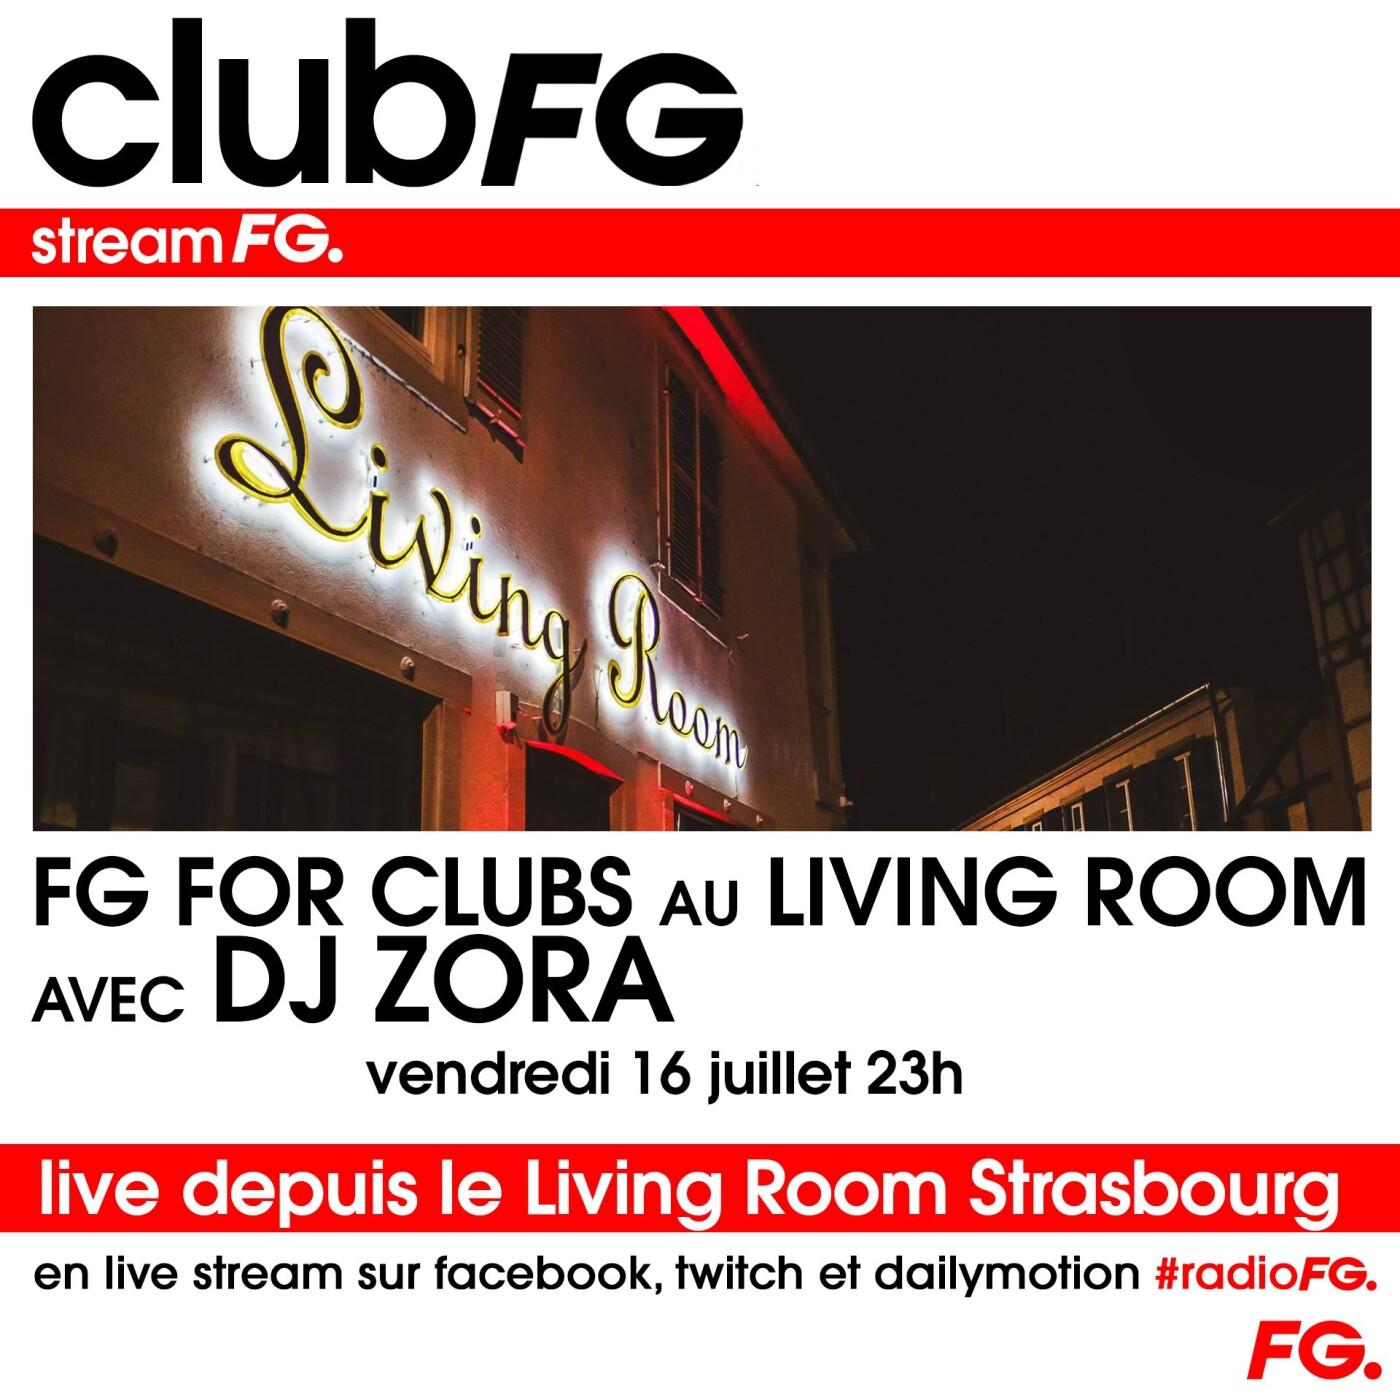 CLOUD PARTY : LIVING ROOM STRASBOURG AVEC ZORA